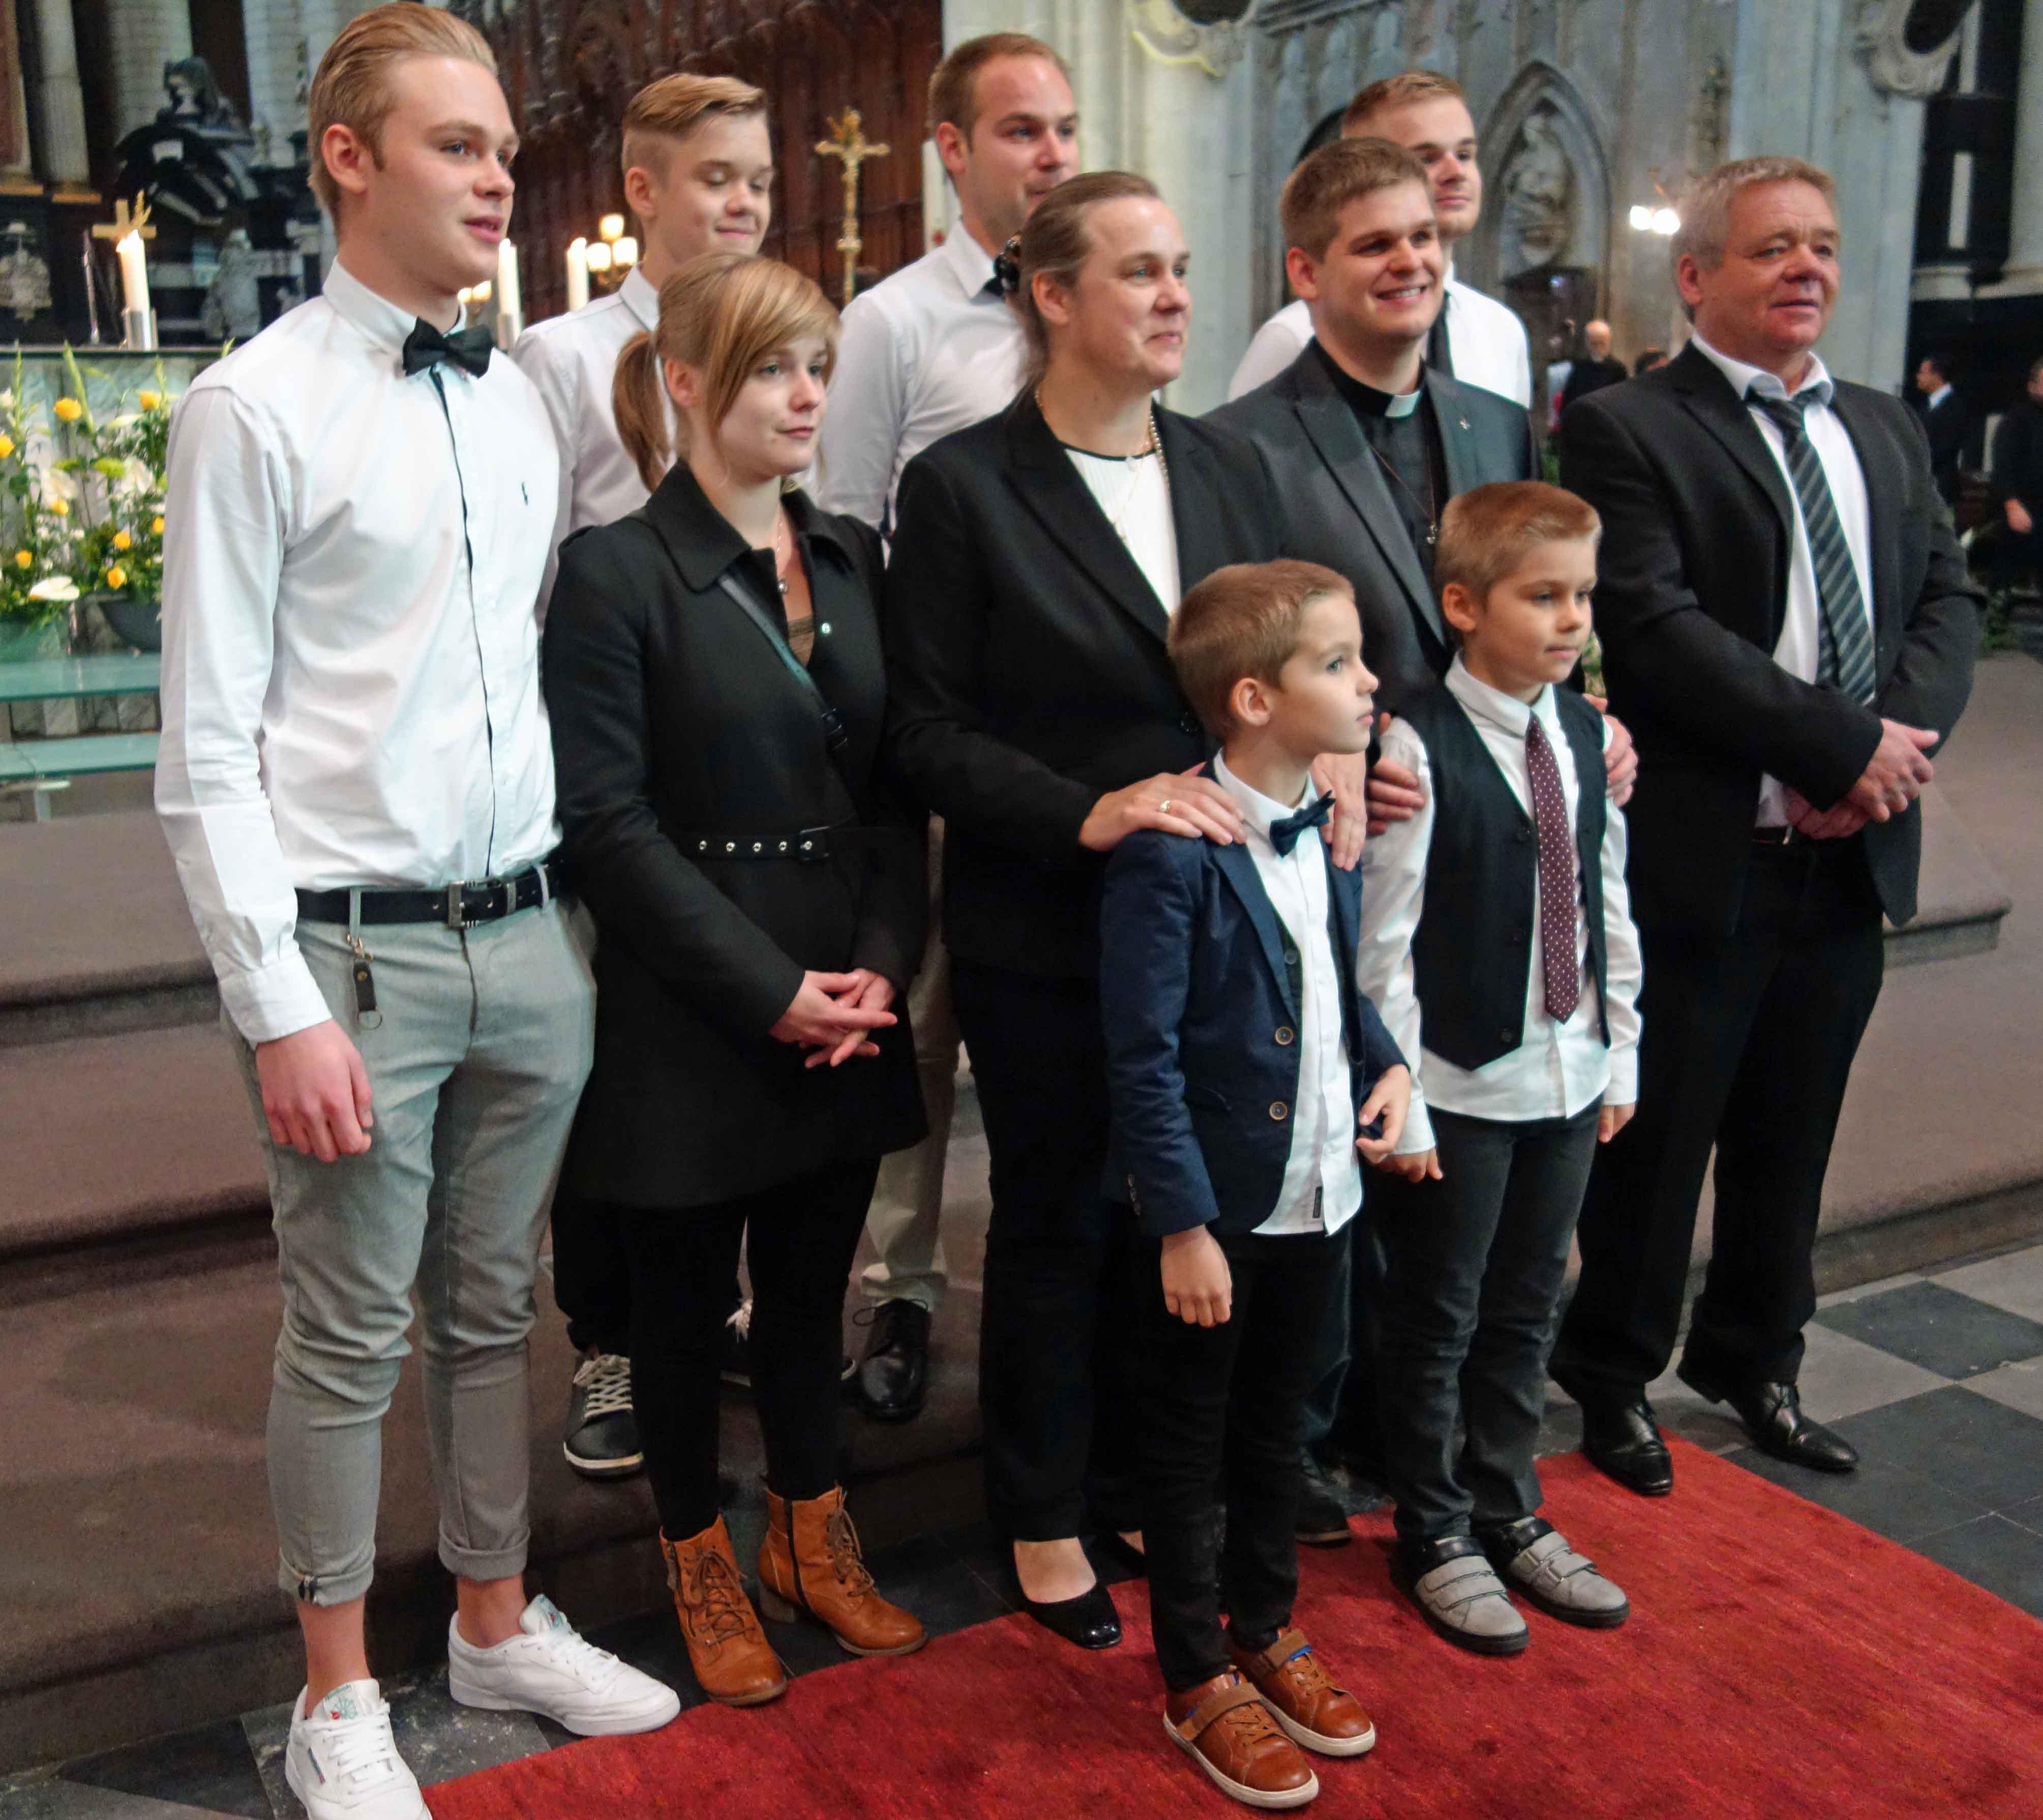 Het gezin Cantaert